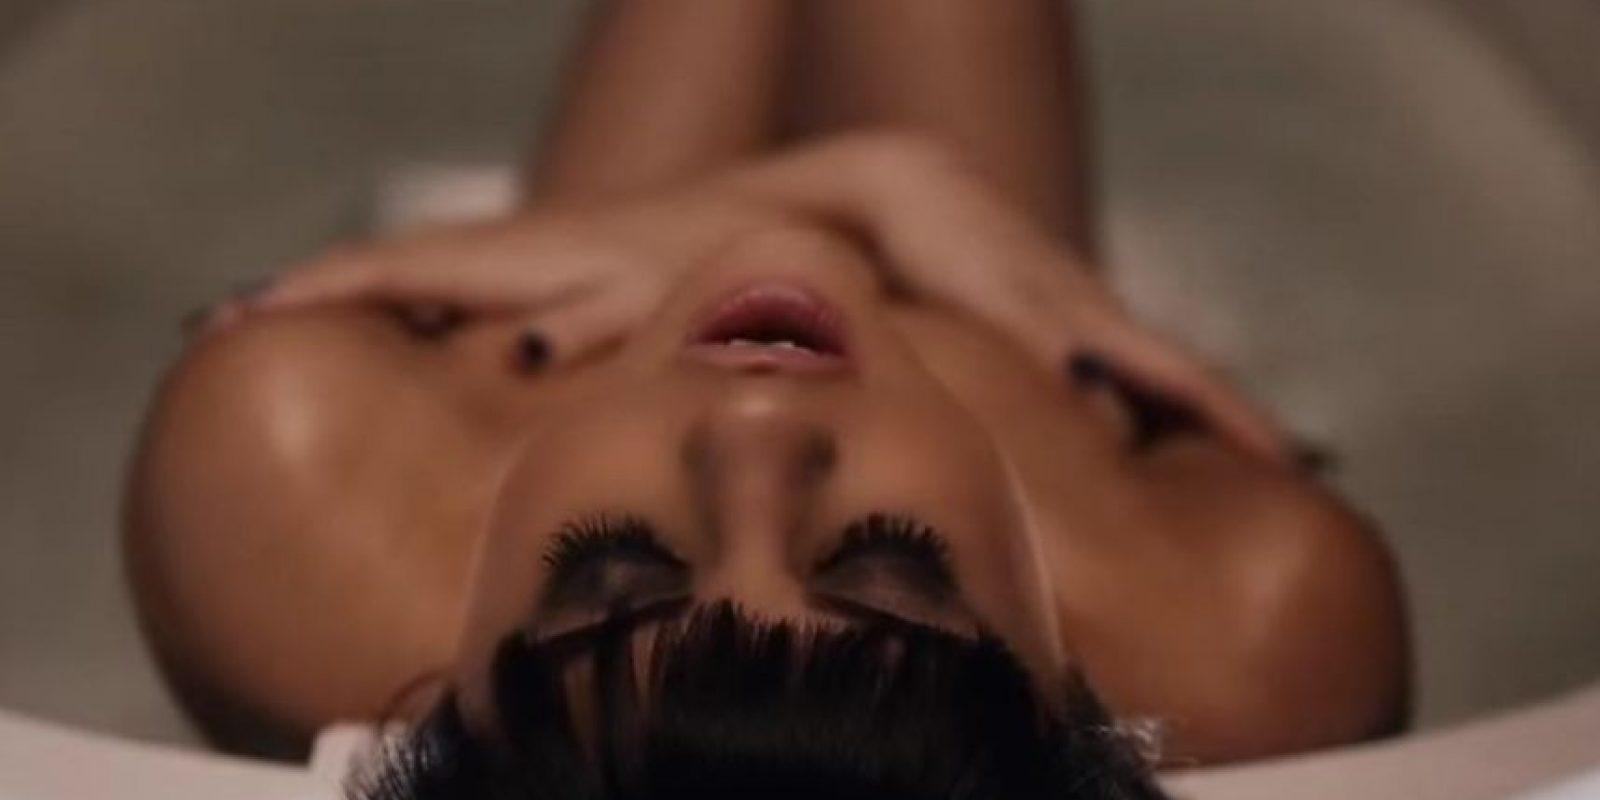 Incluso, se mete a su bañera. Foto:YouTube/SelenaGomez